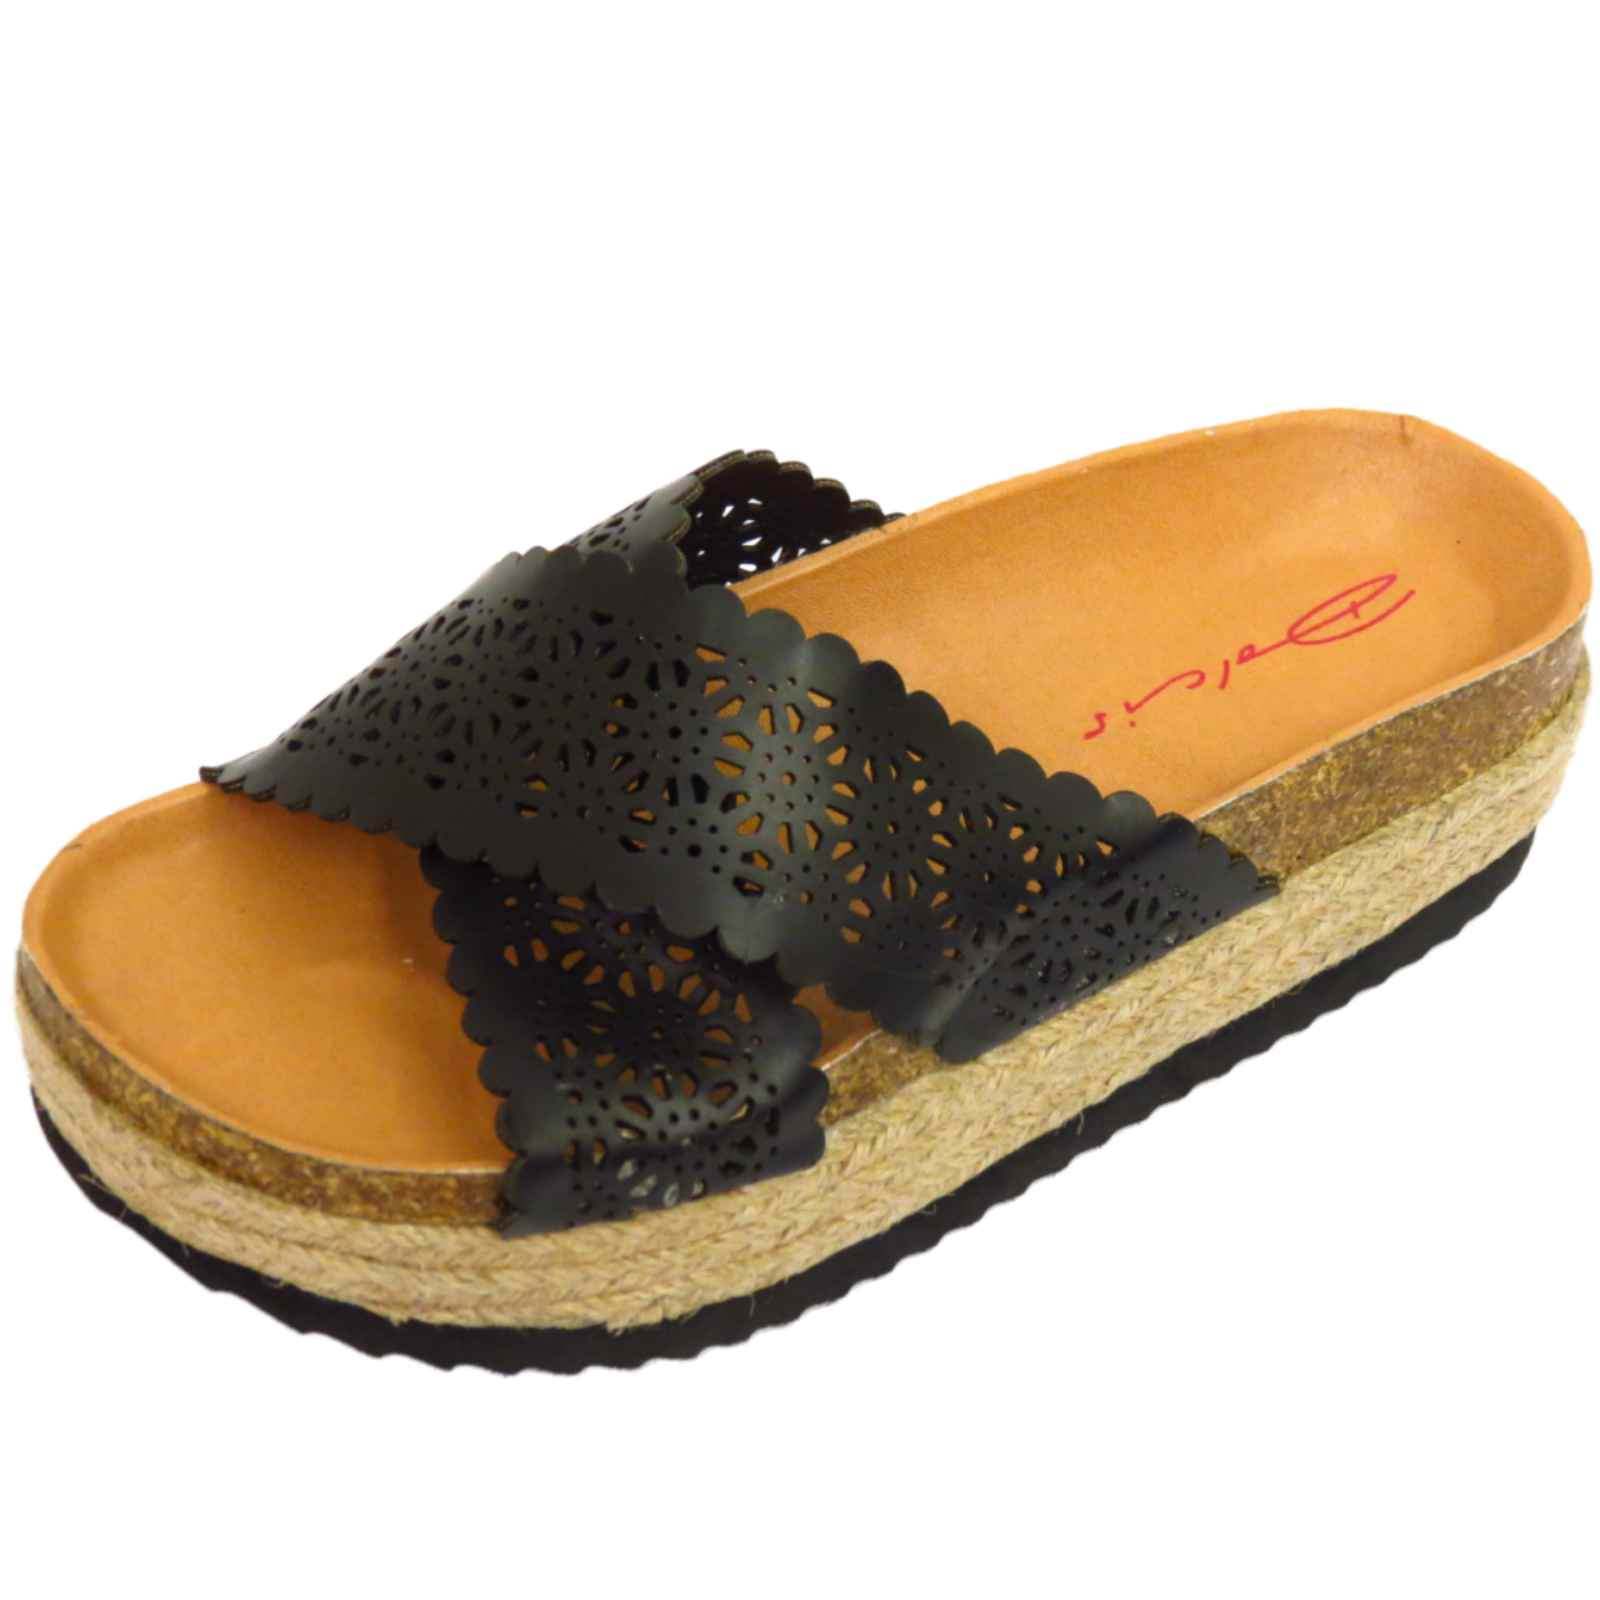 dolcis black slip on platform chunky sandals wedges